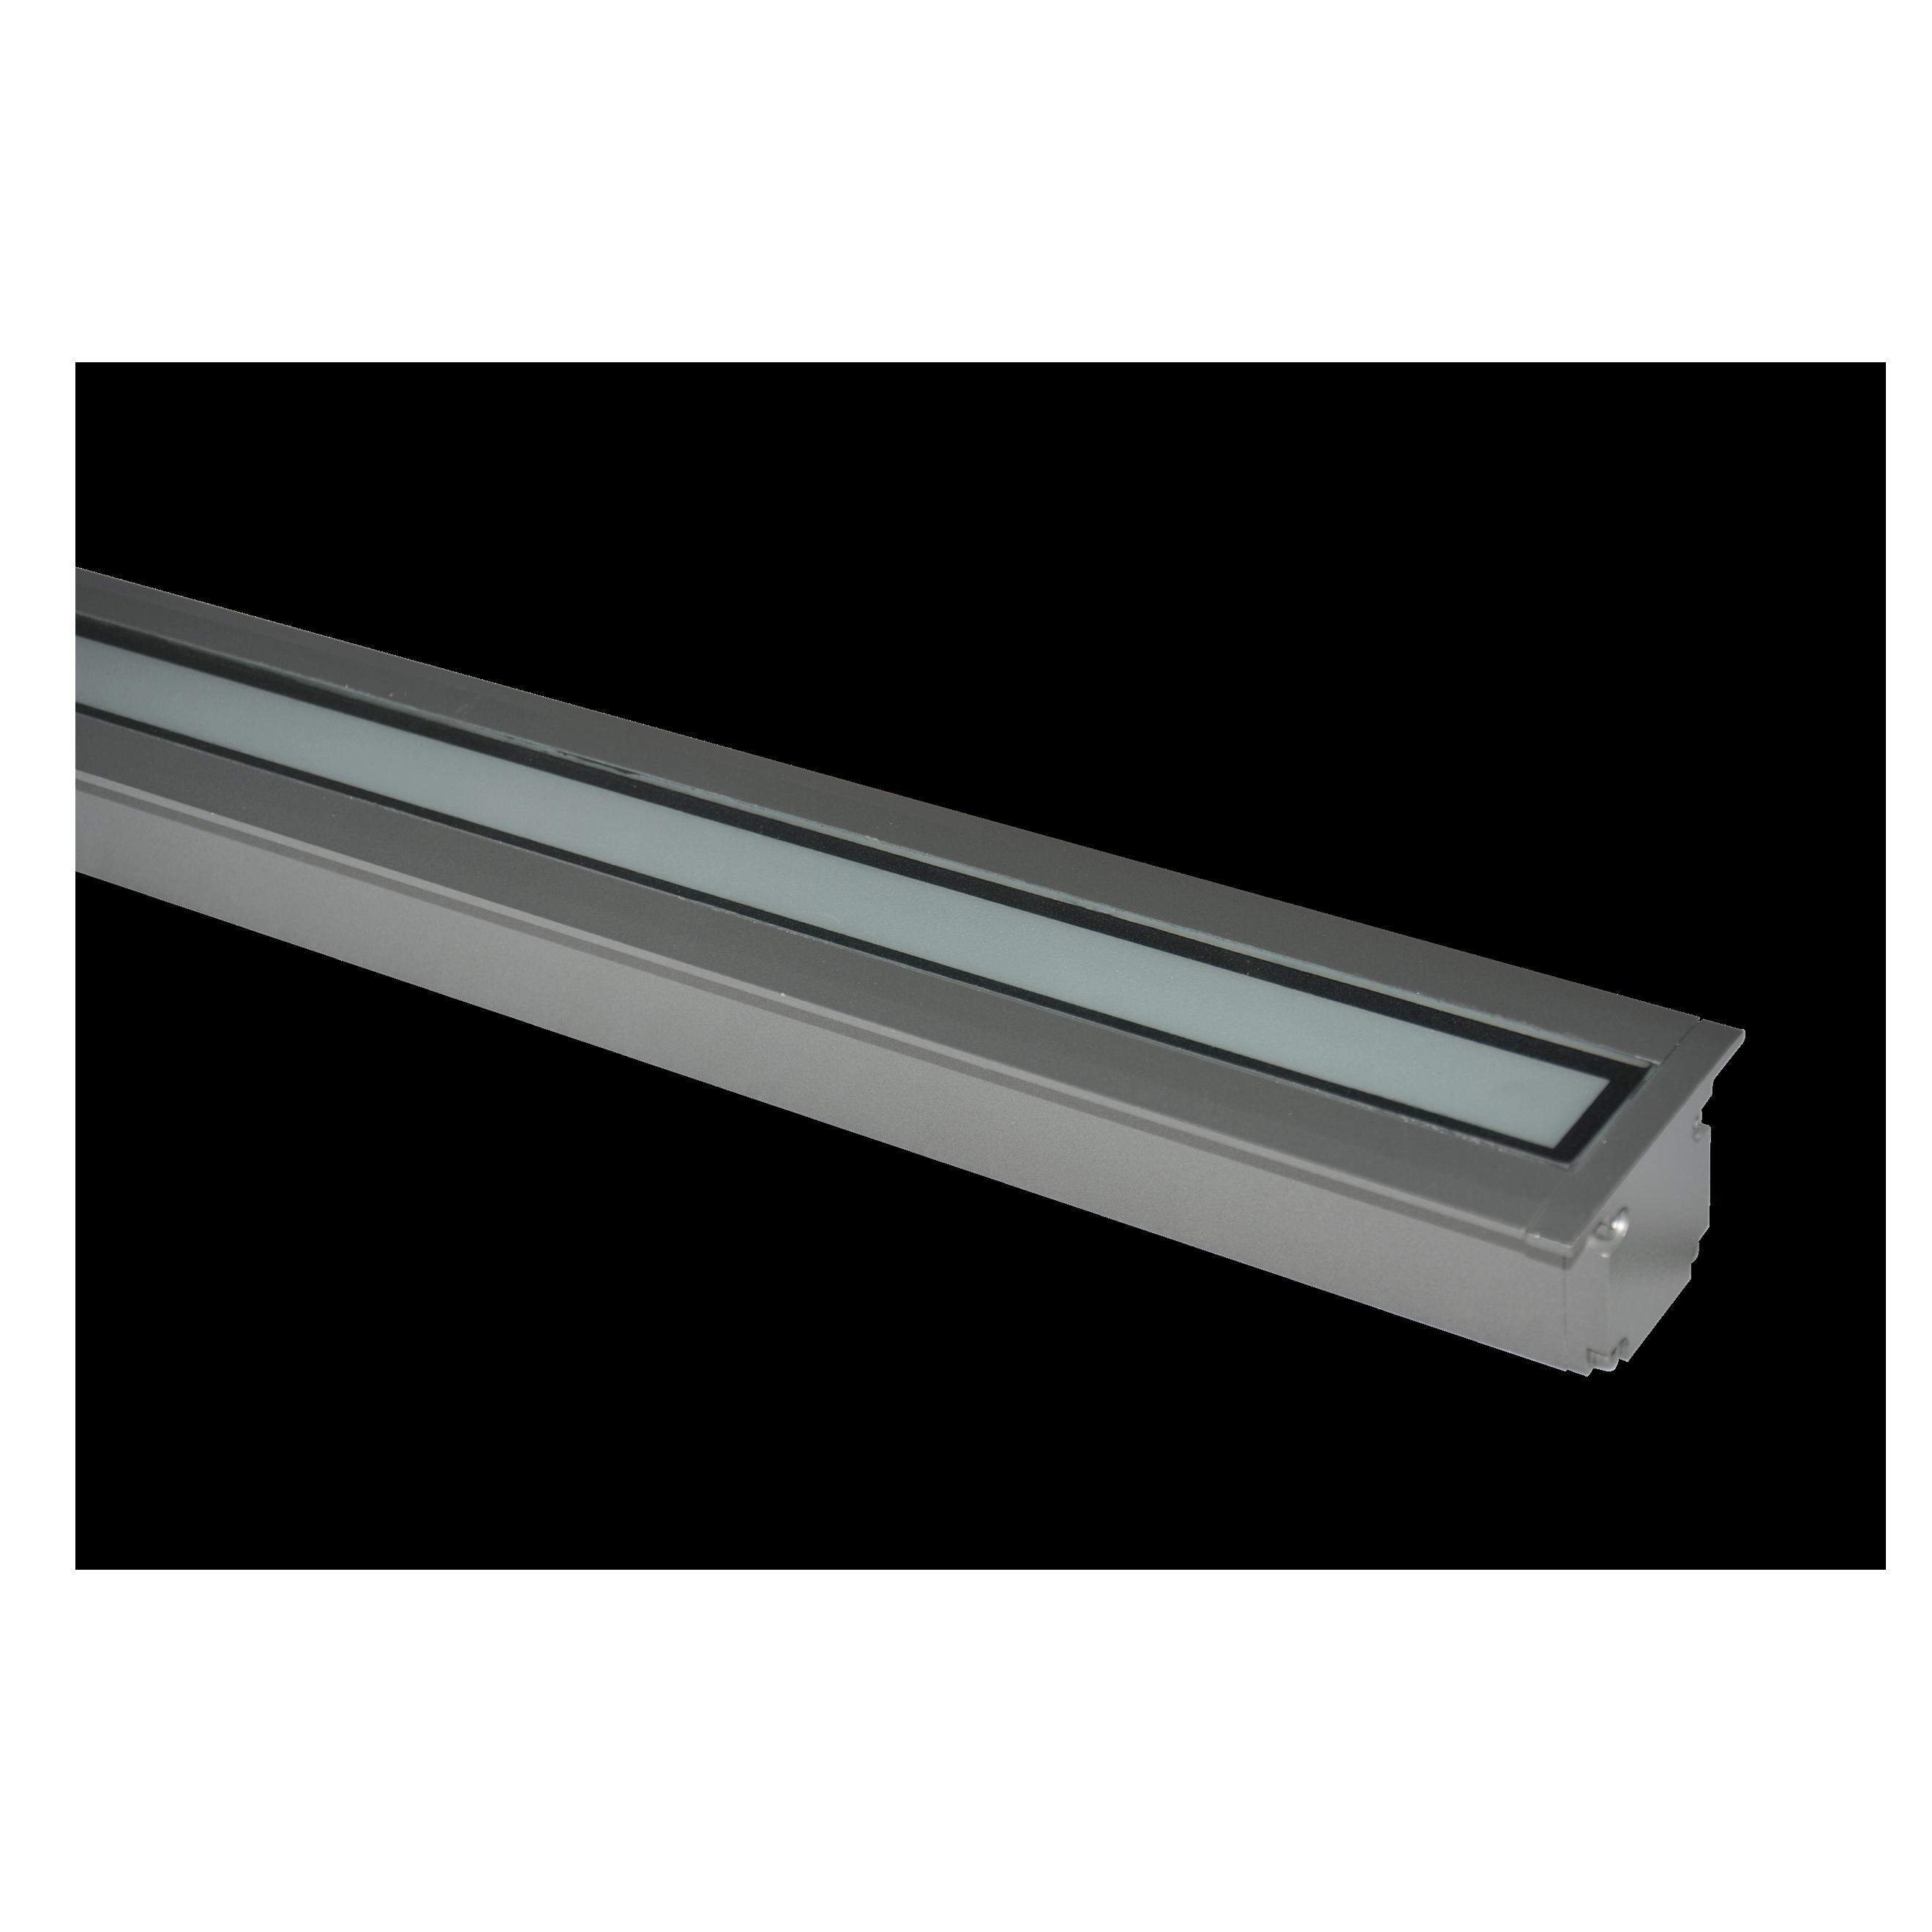 Linear Recessed RGB buried IK08 LED up light IP67 LED inground light outdoor lighting landscape exterior facade underground ligh